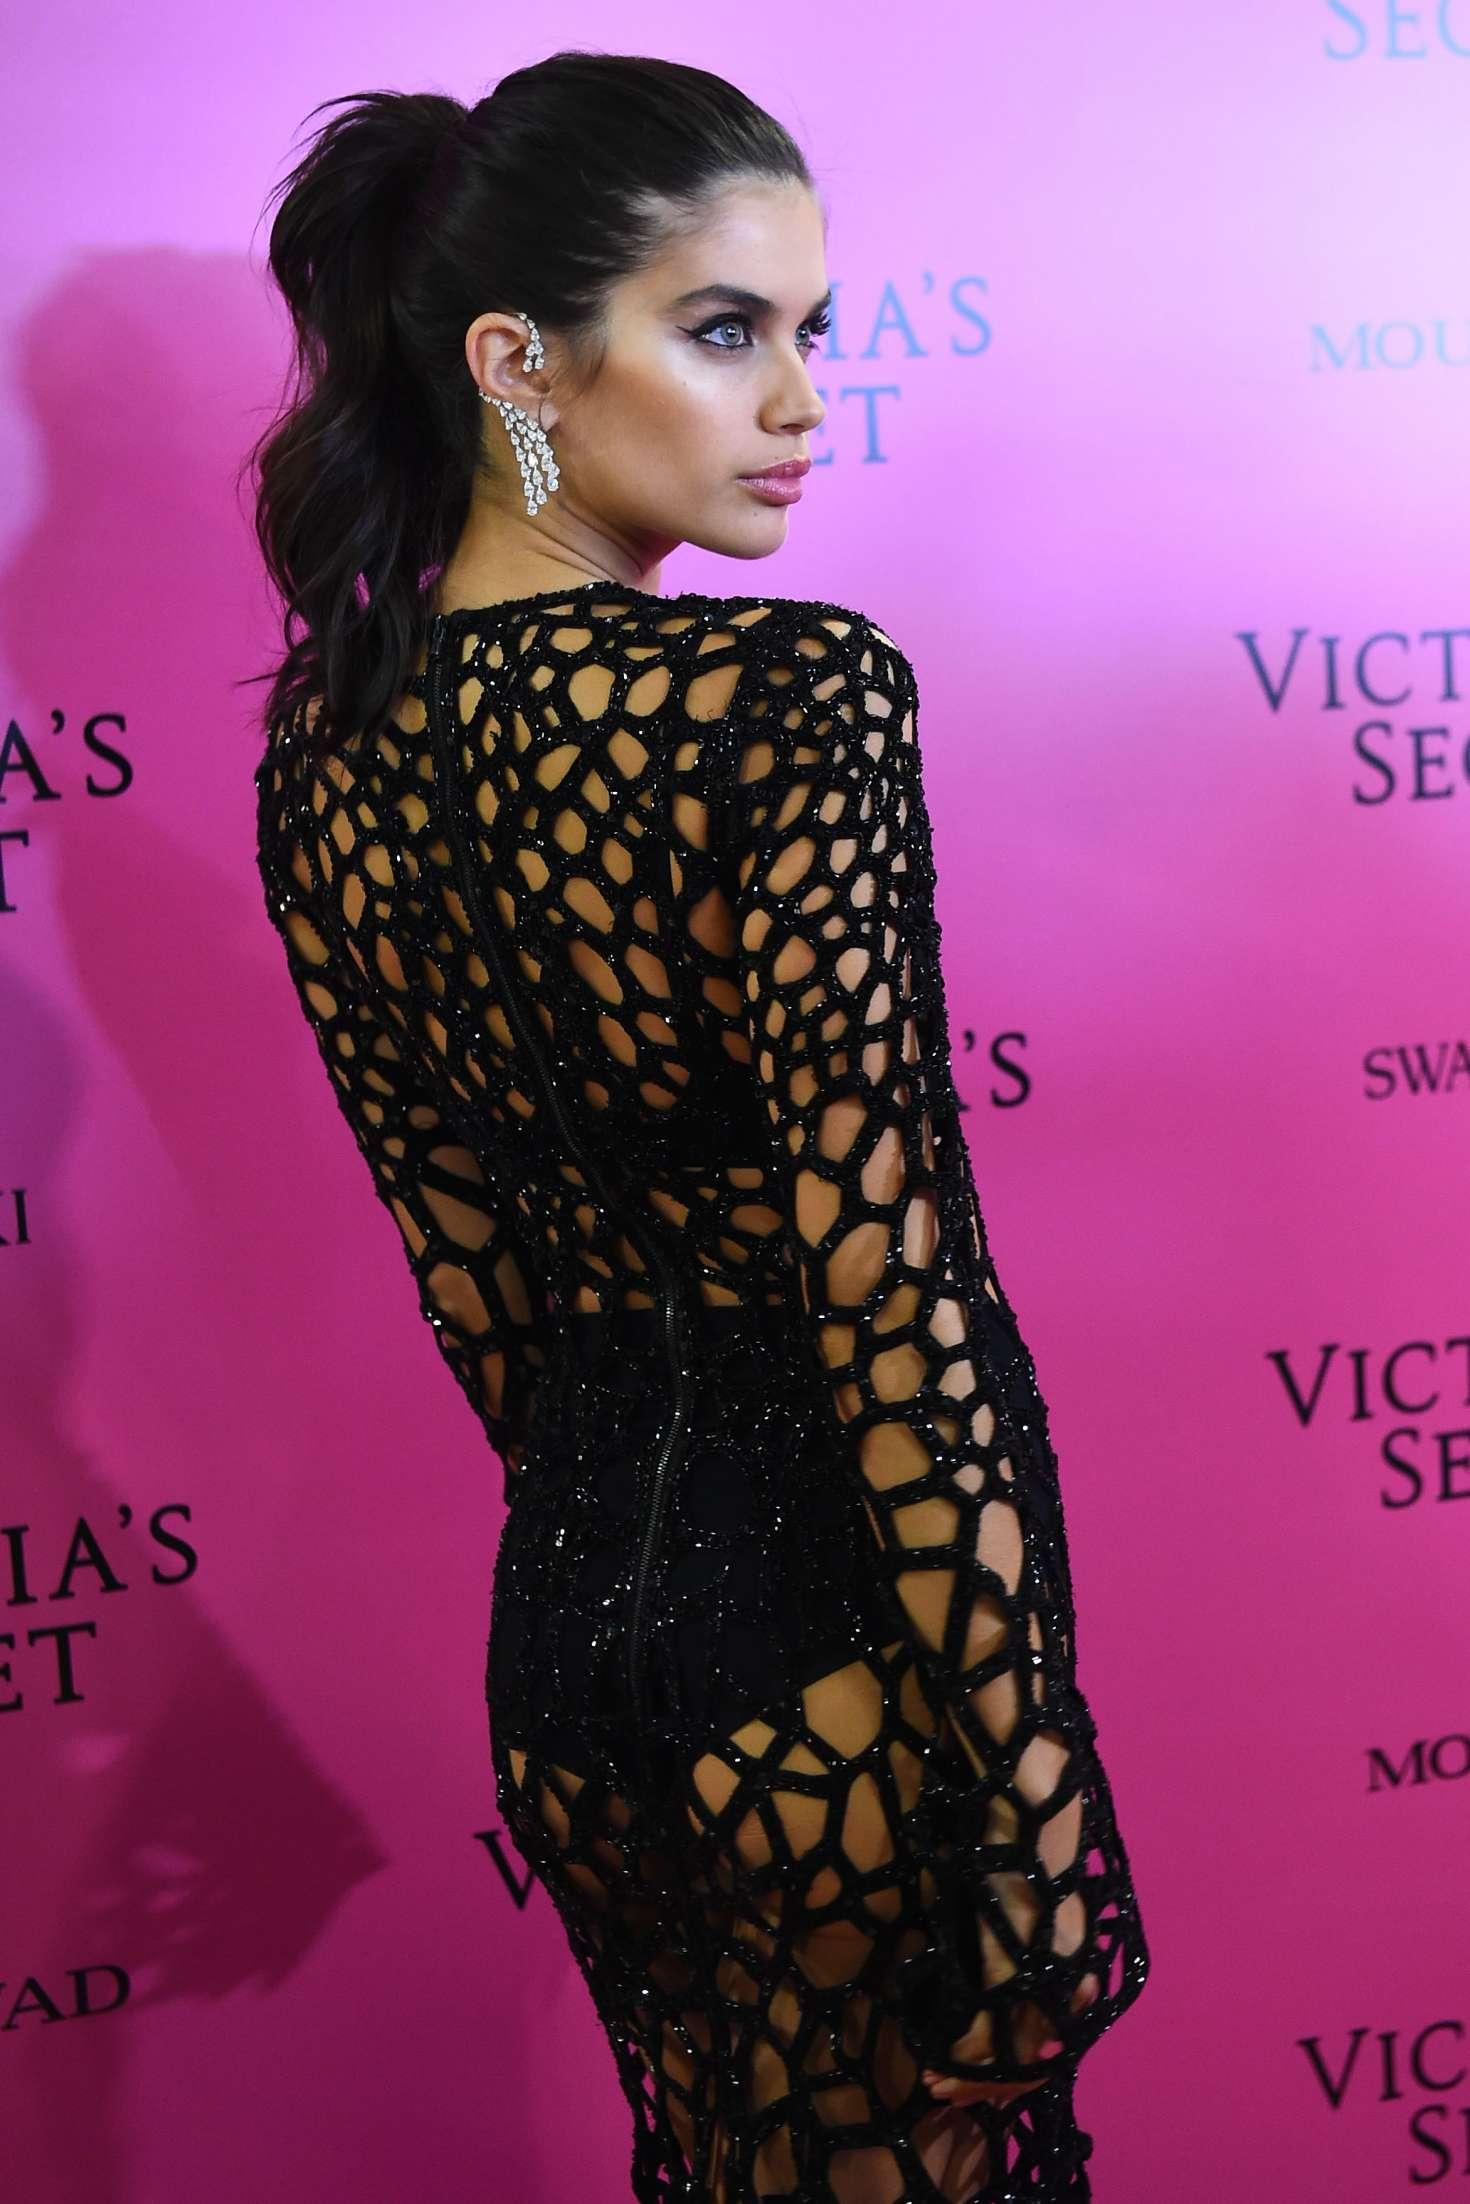 Sara Sampaio 2017 : Sara Sampaio: 2017 Victorias Secret Fashion Show After Party -02